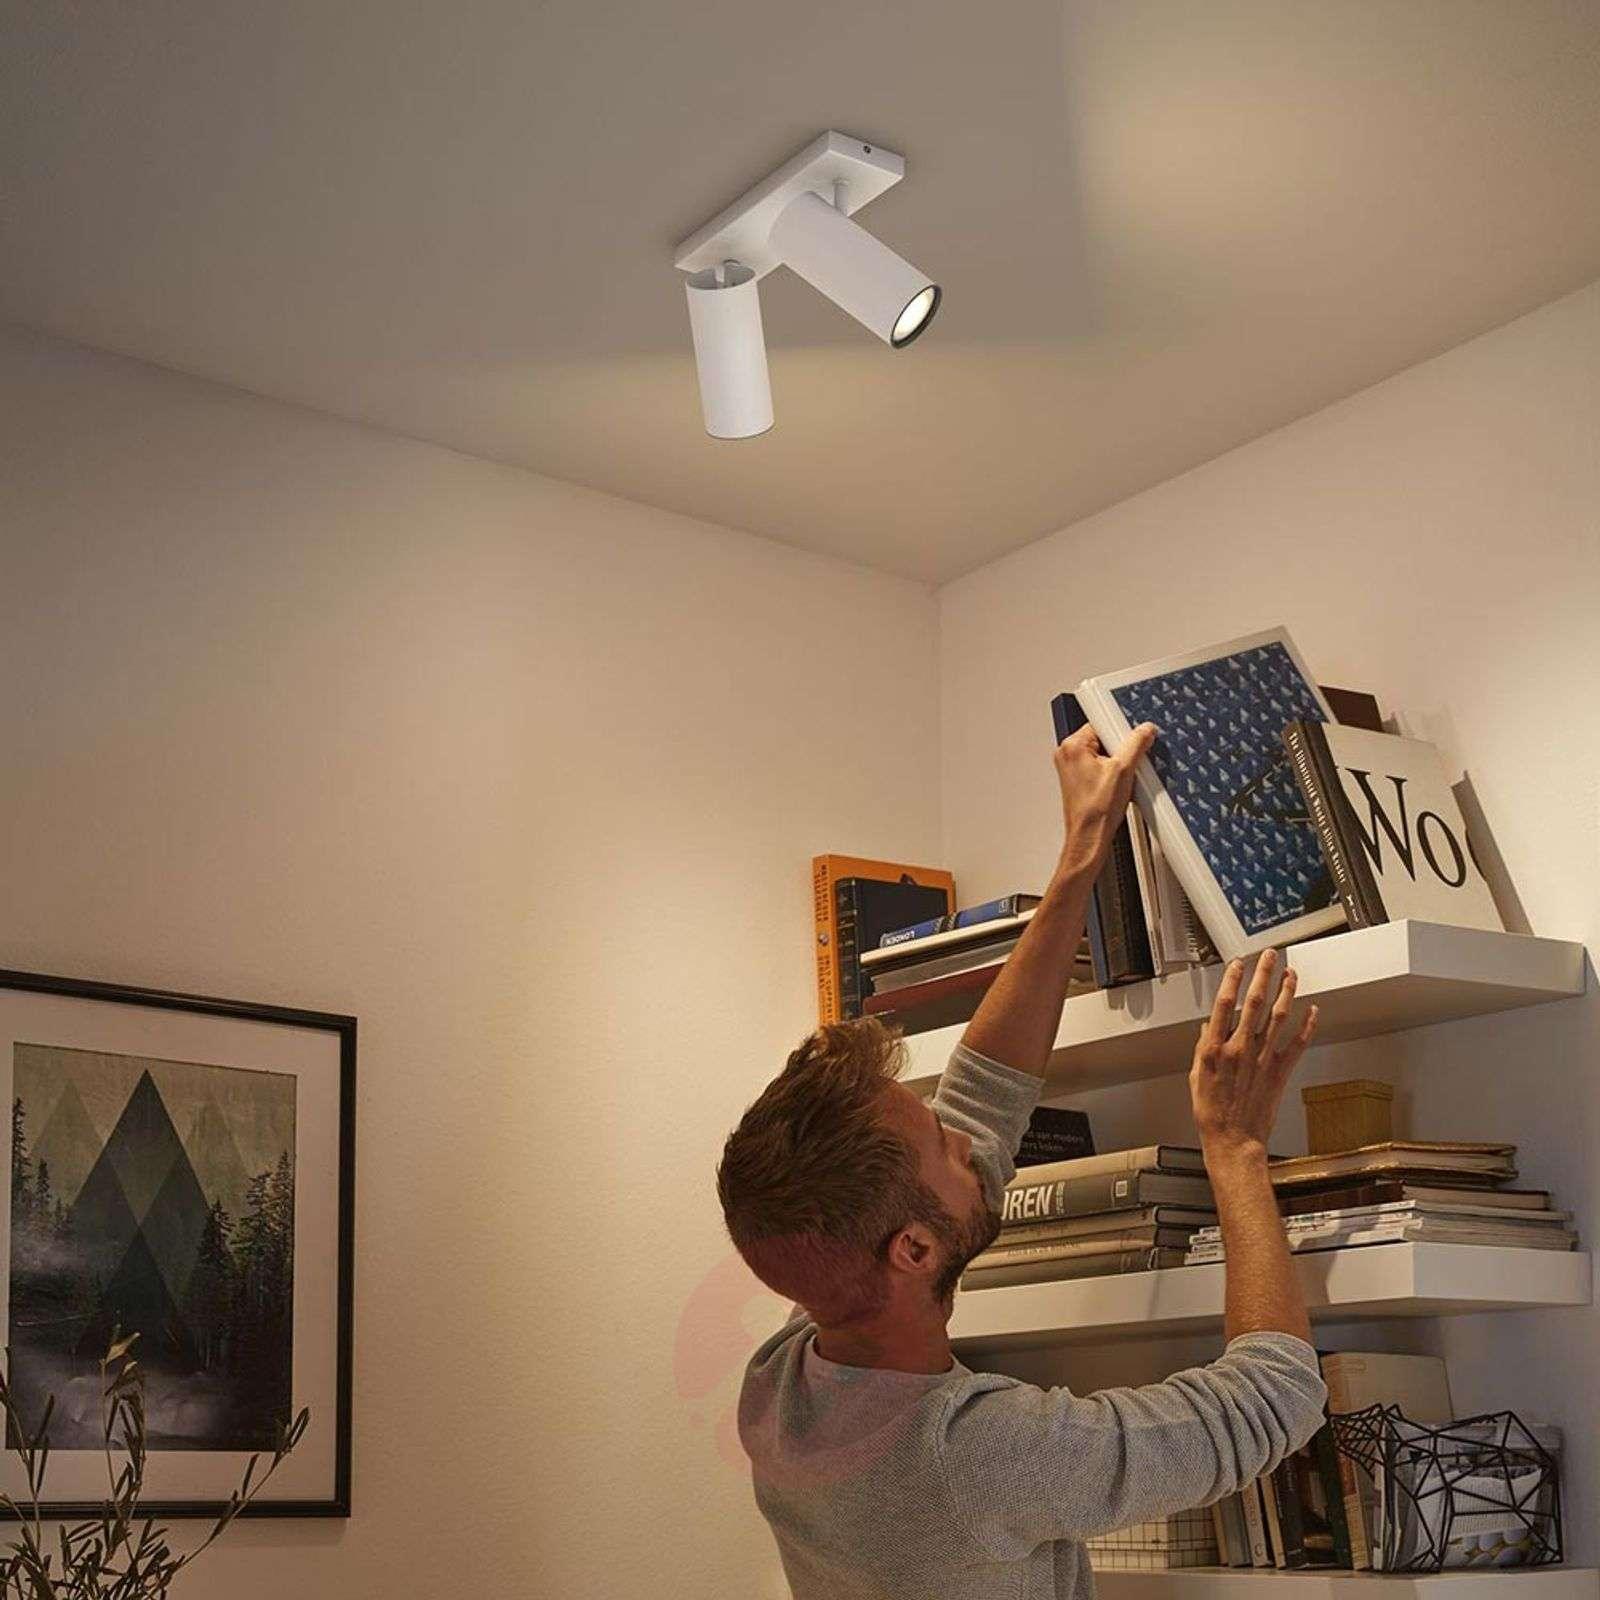 Philips Hue Buratto LED spot white 2-bulb dimmer-7532042-01